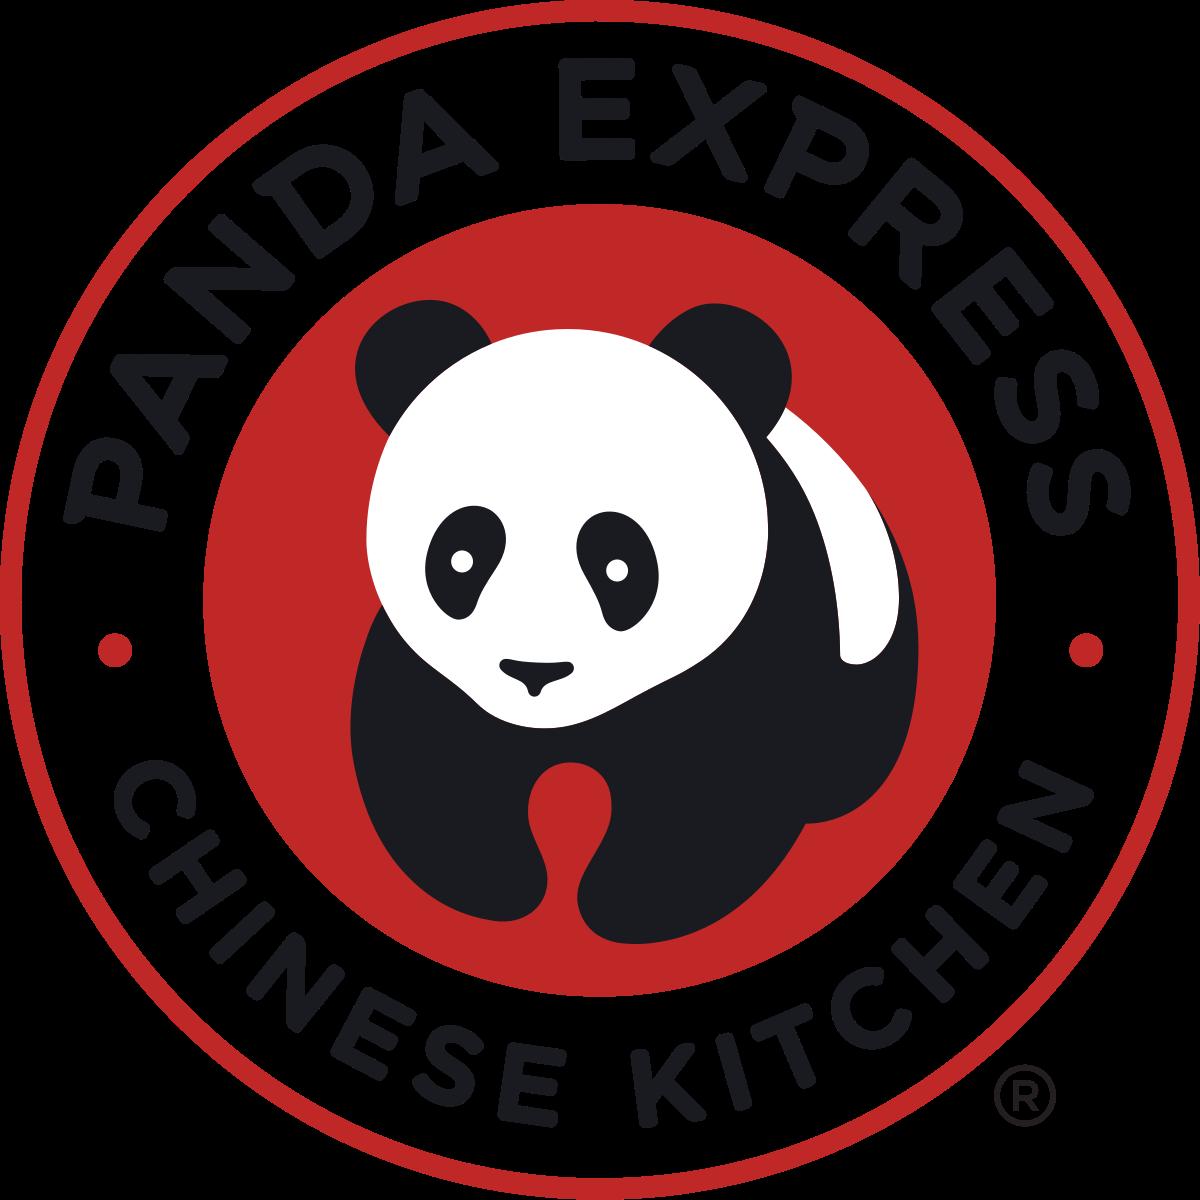 Panda Express - 1488